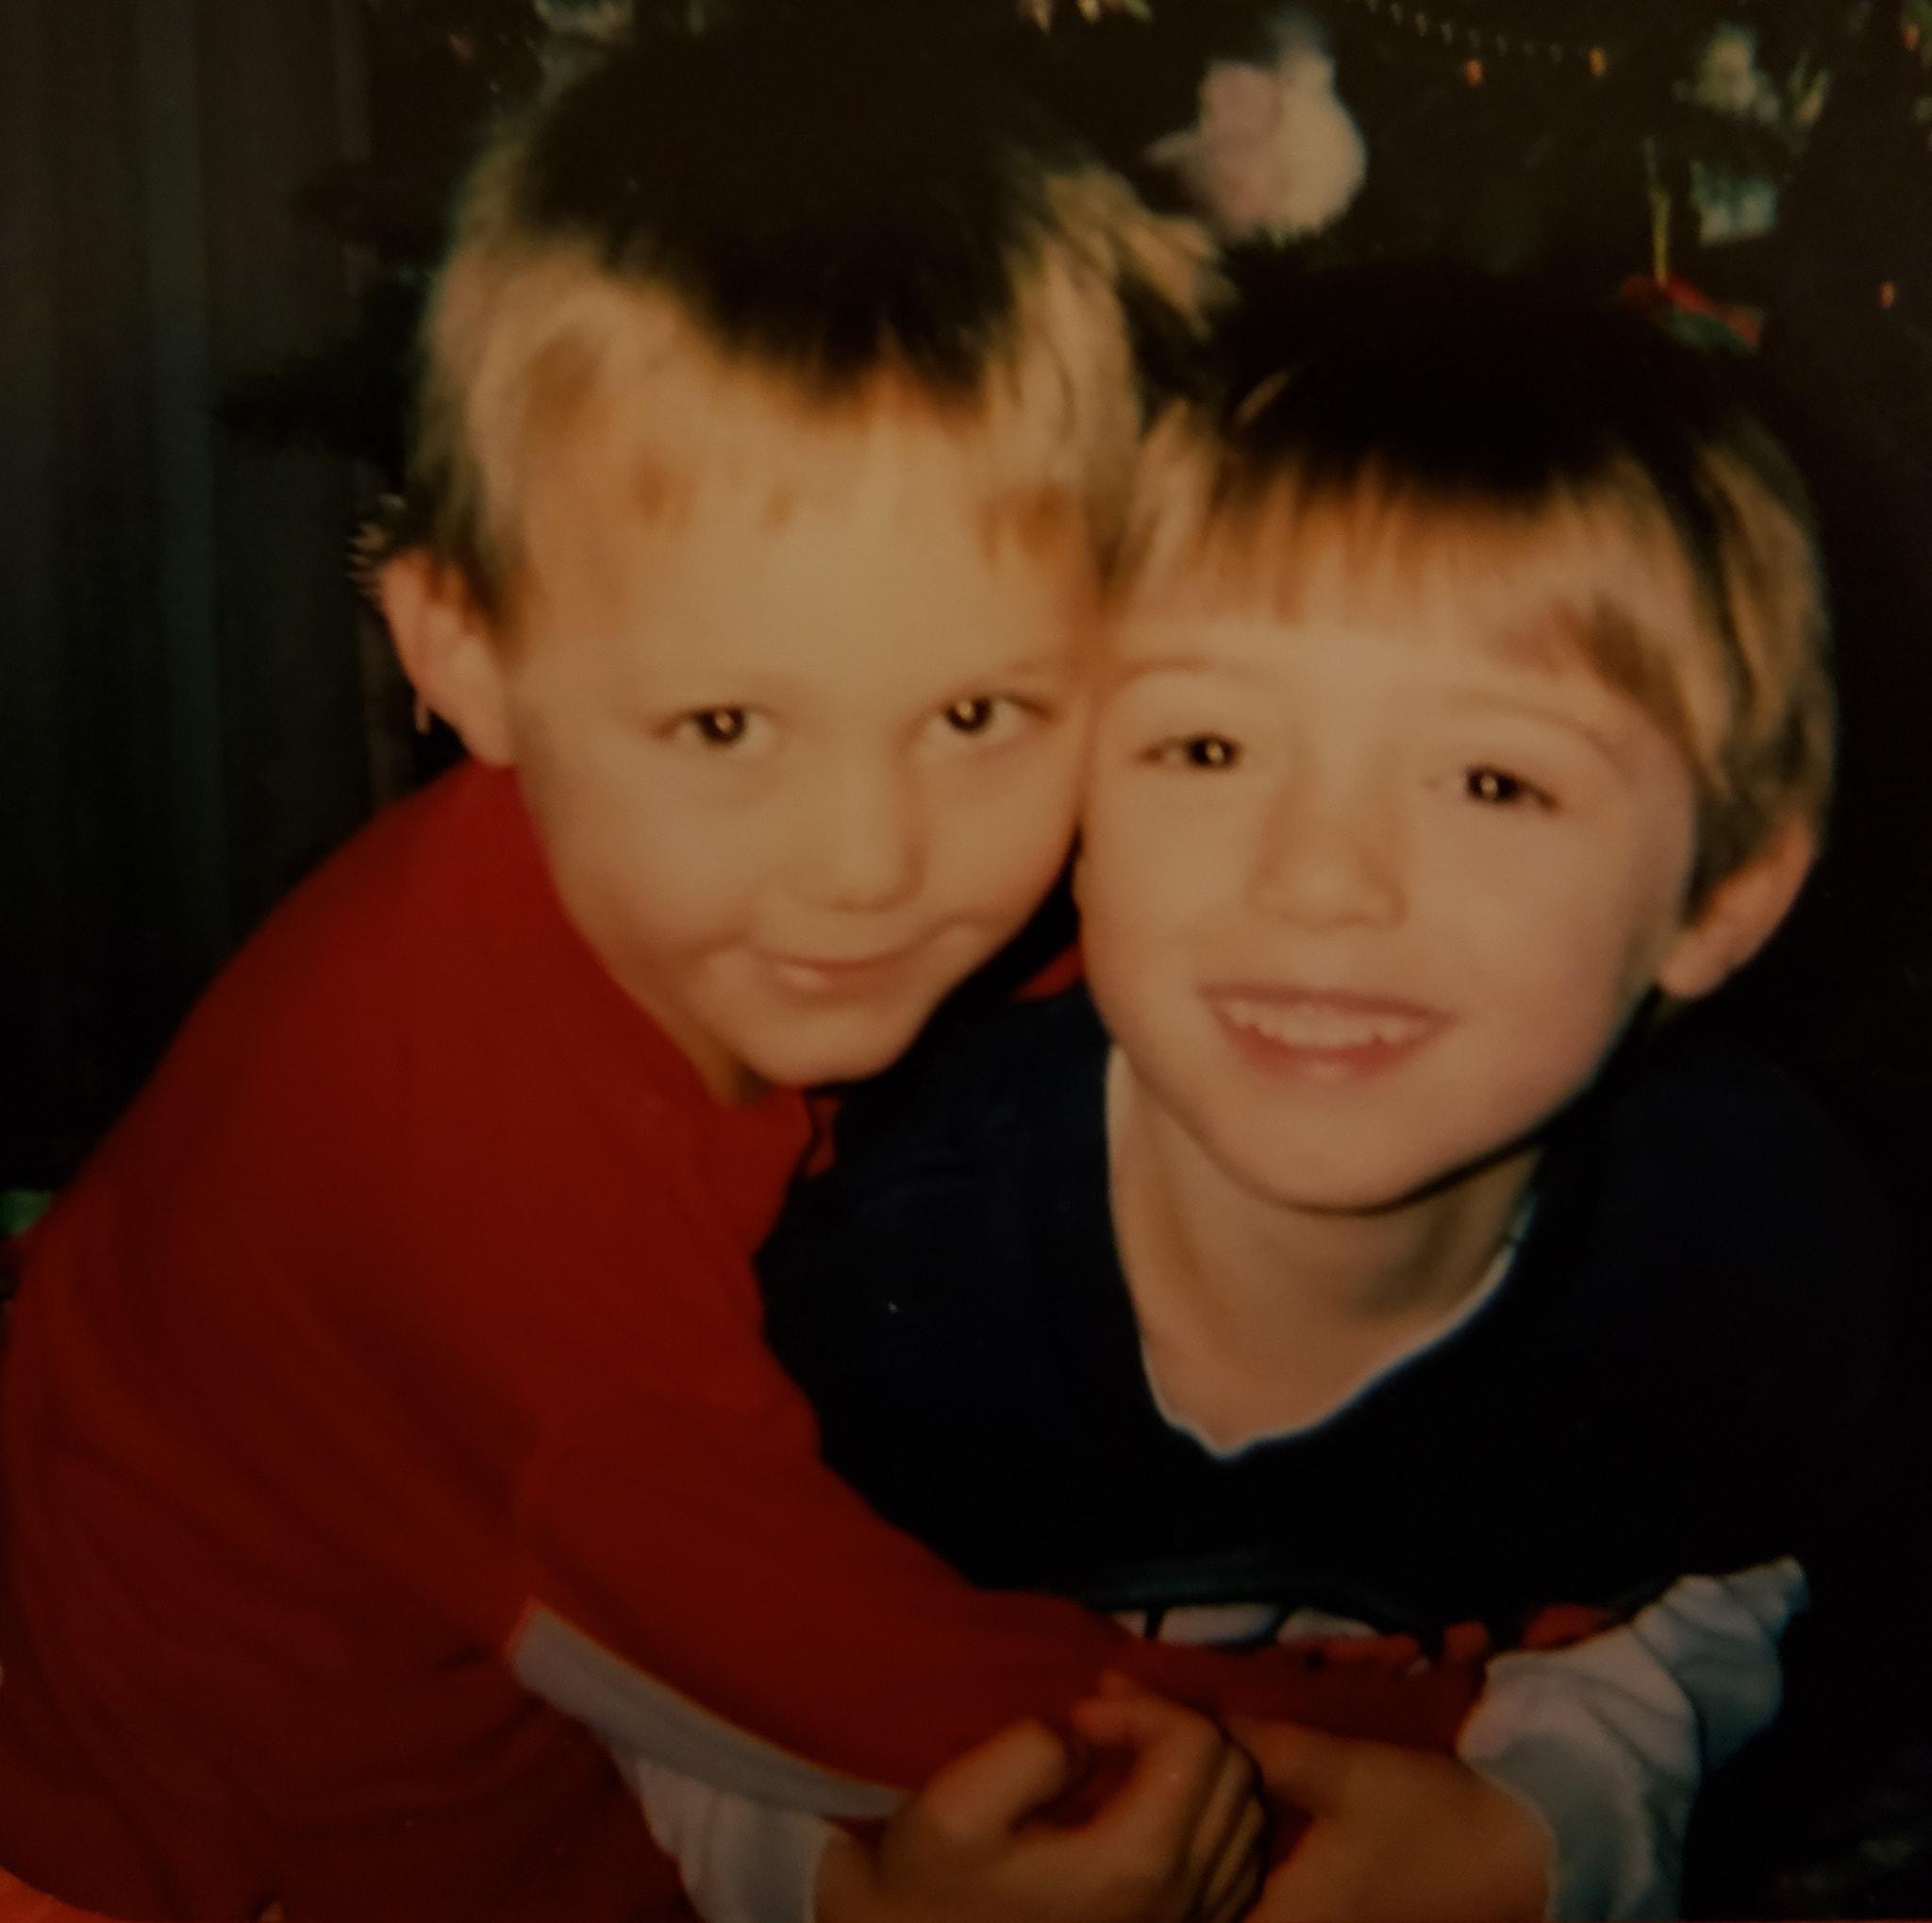 Caleb and kyler young